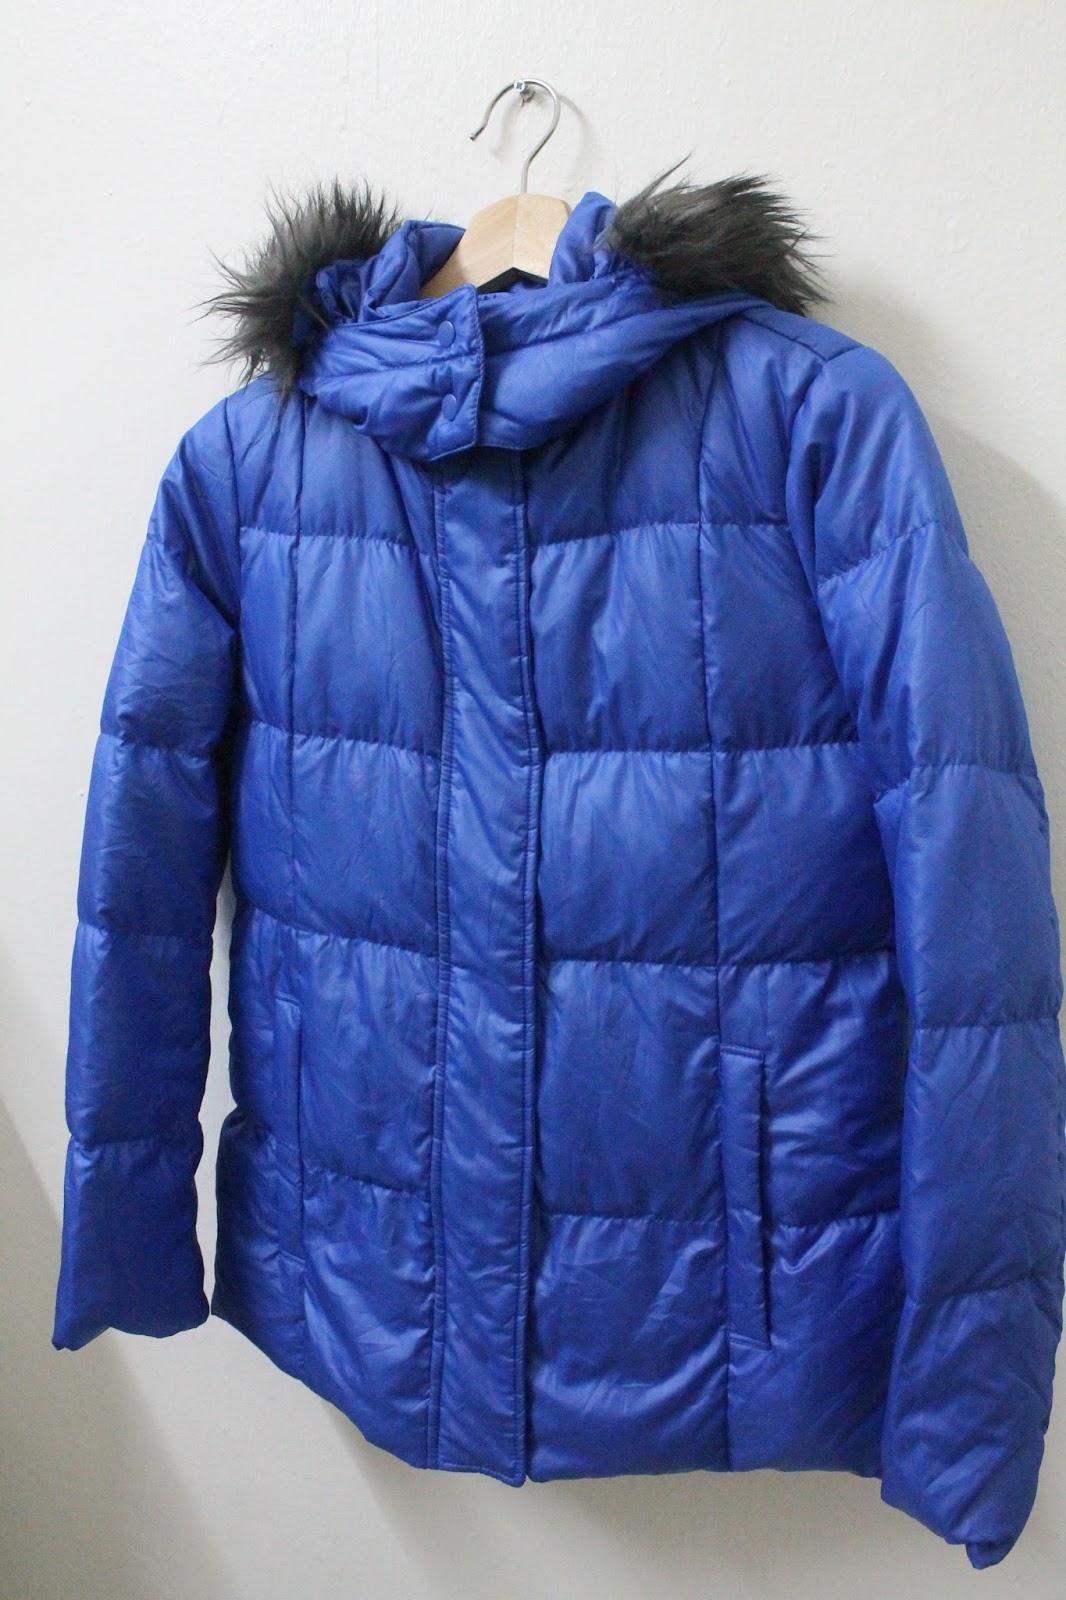 bundlebarangbaek uniqlo winter hoodie jacket size s for. Black Bedroom Furniture Sets. Home Design Ideas